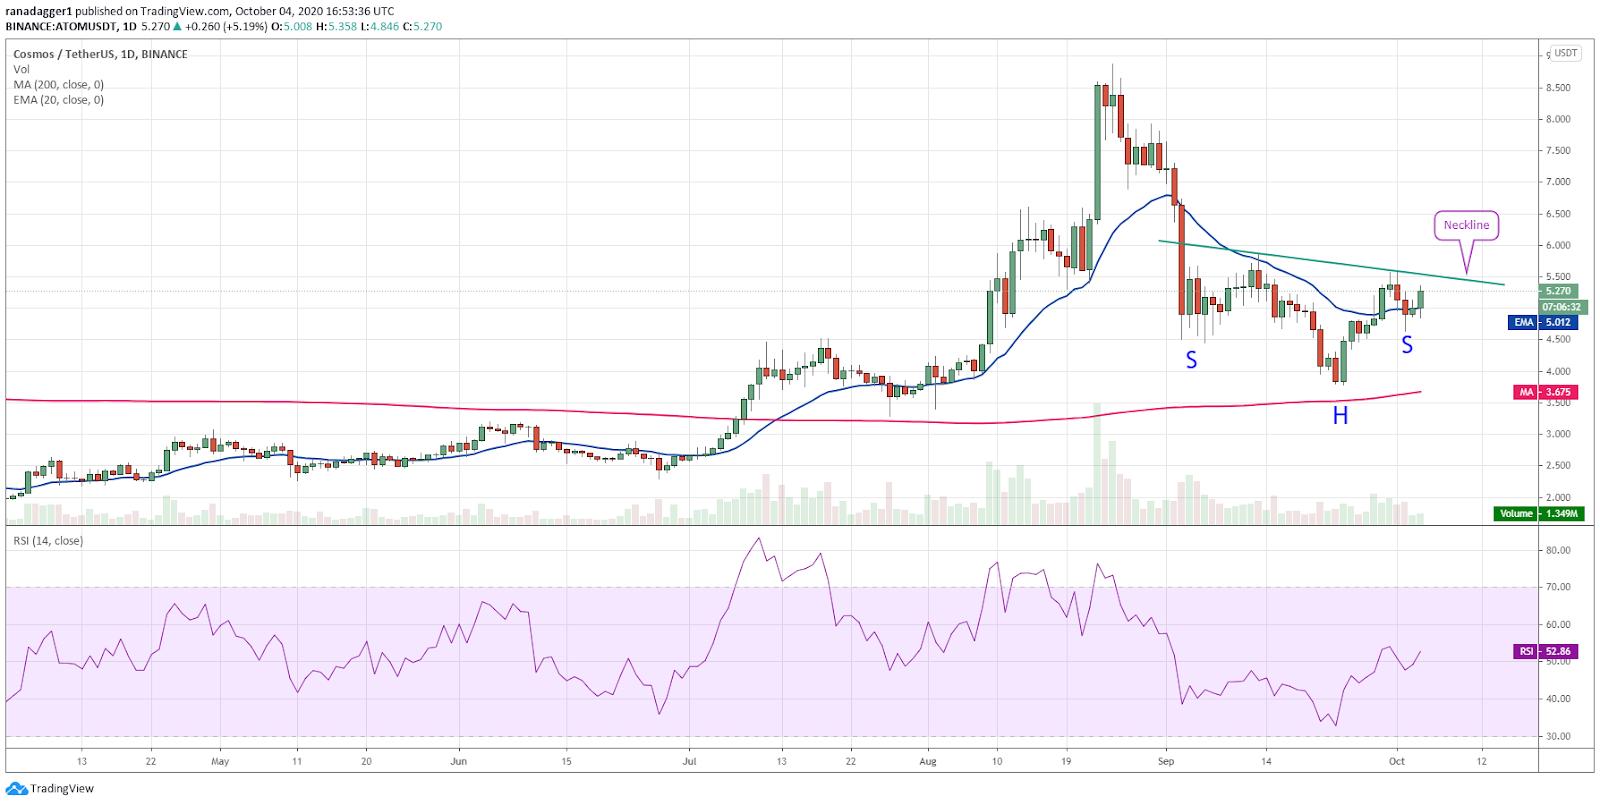 ATOM/USD daily chart. Source: TradingView